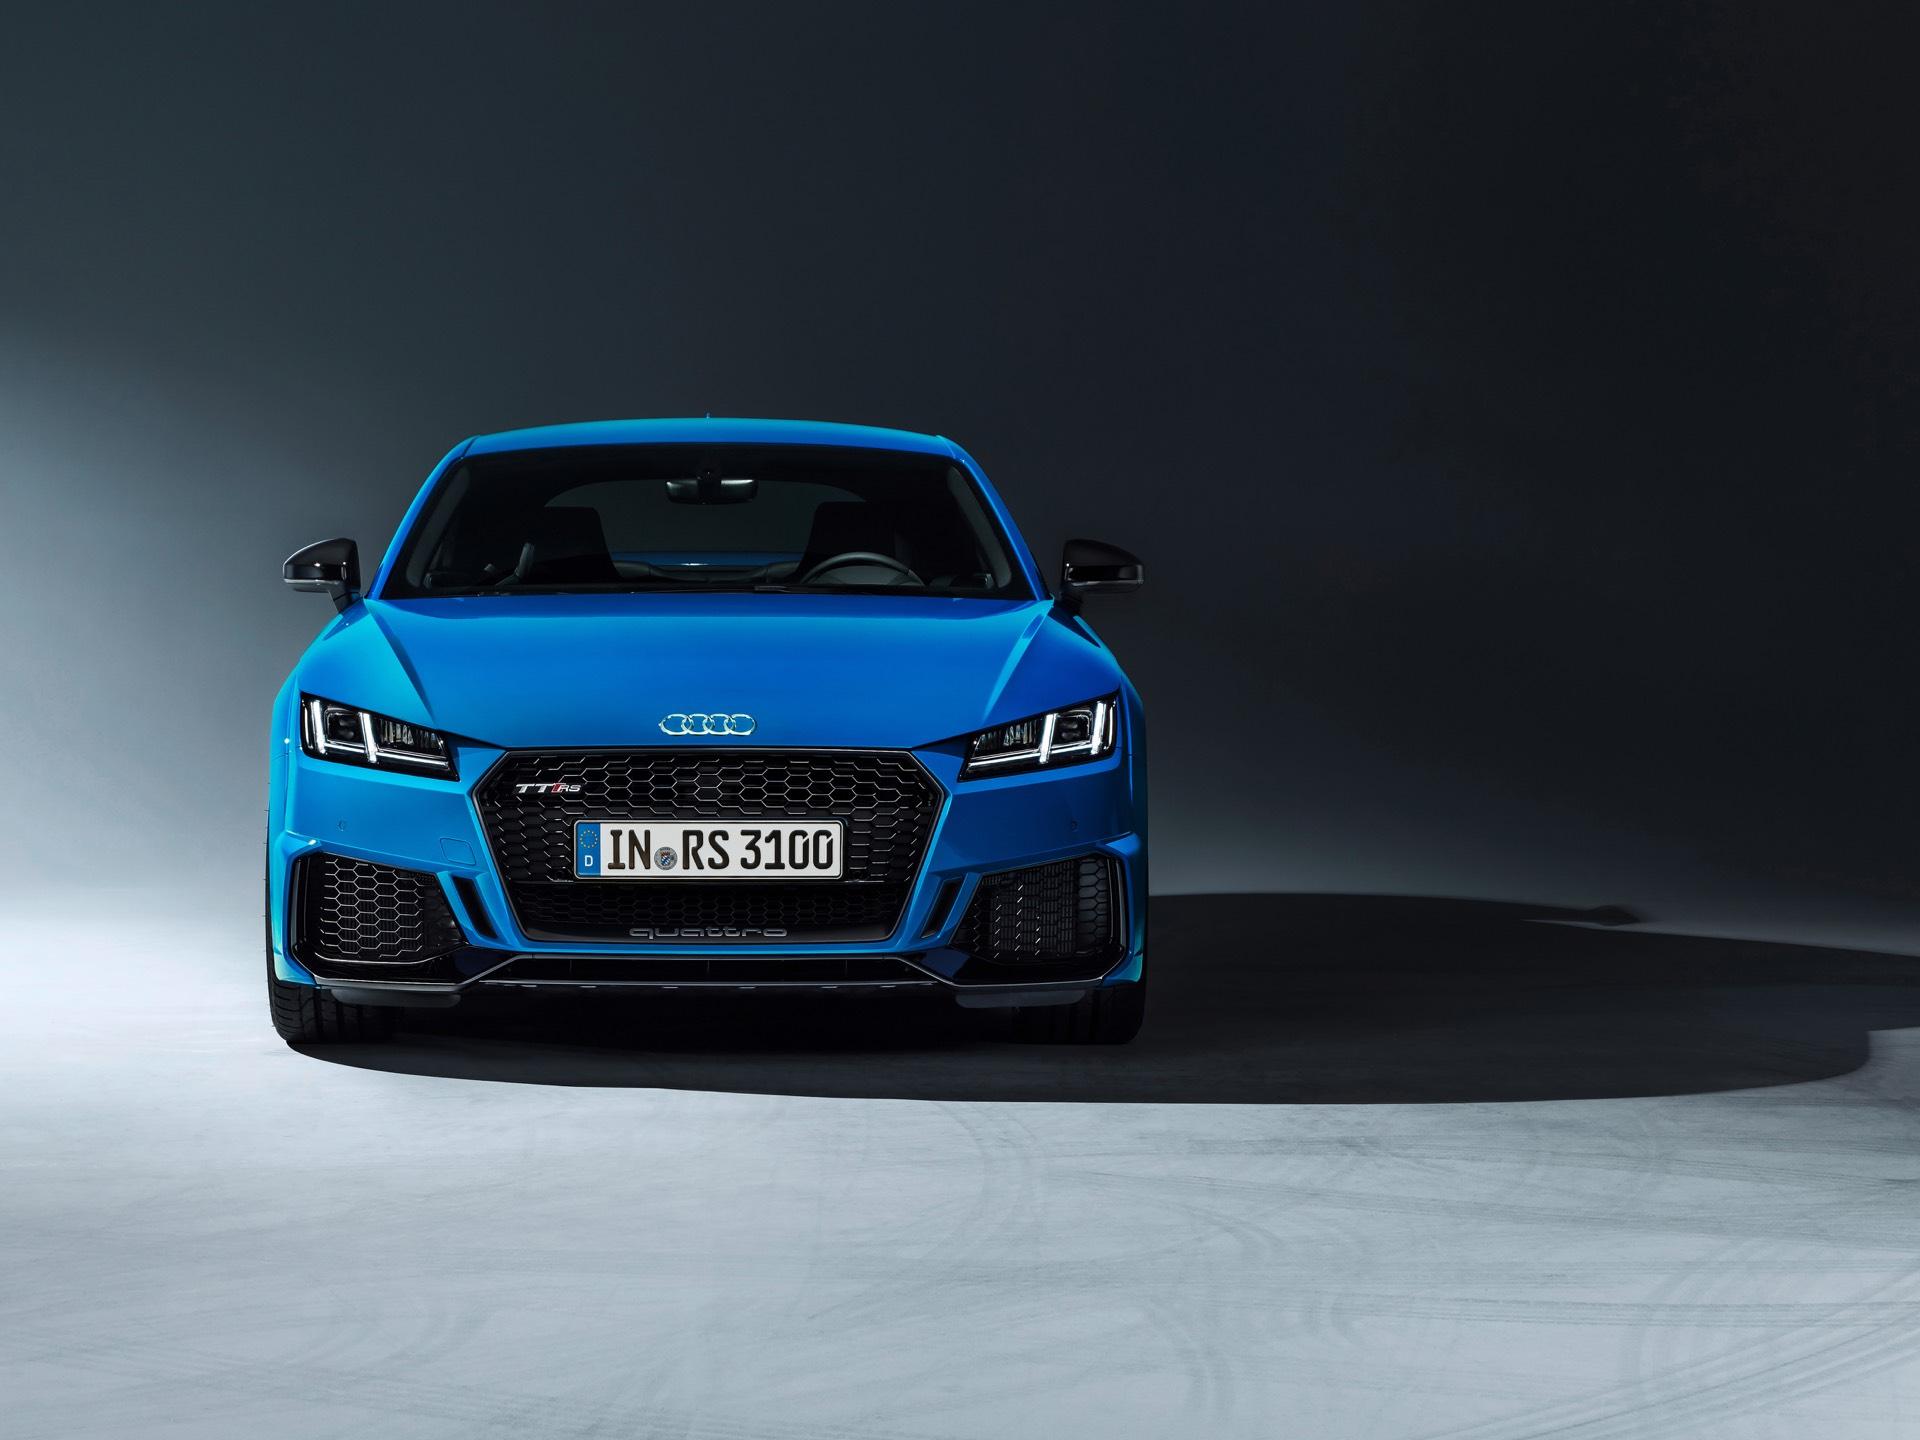 Audi Tt Rs >> Audi Tt Rs Coupe And Tt Rs Roadster Get Facelift Gtspirit